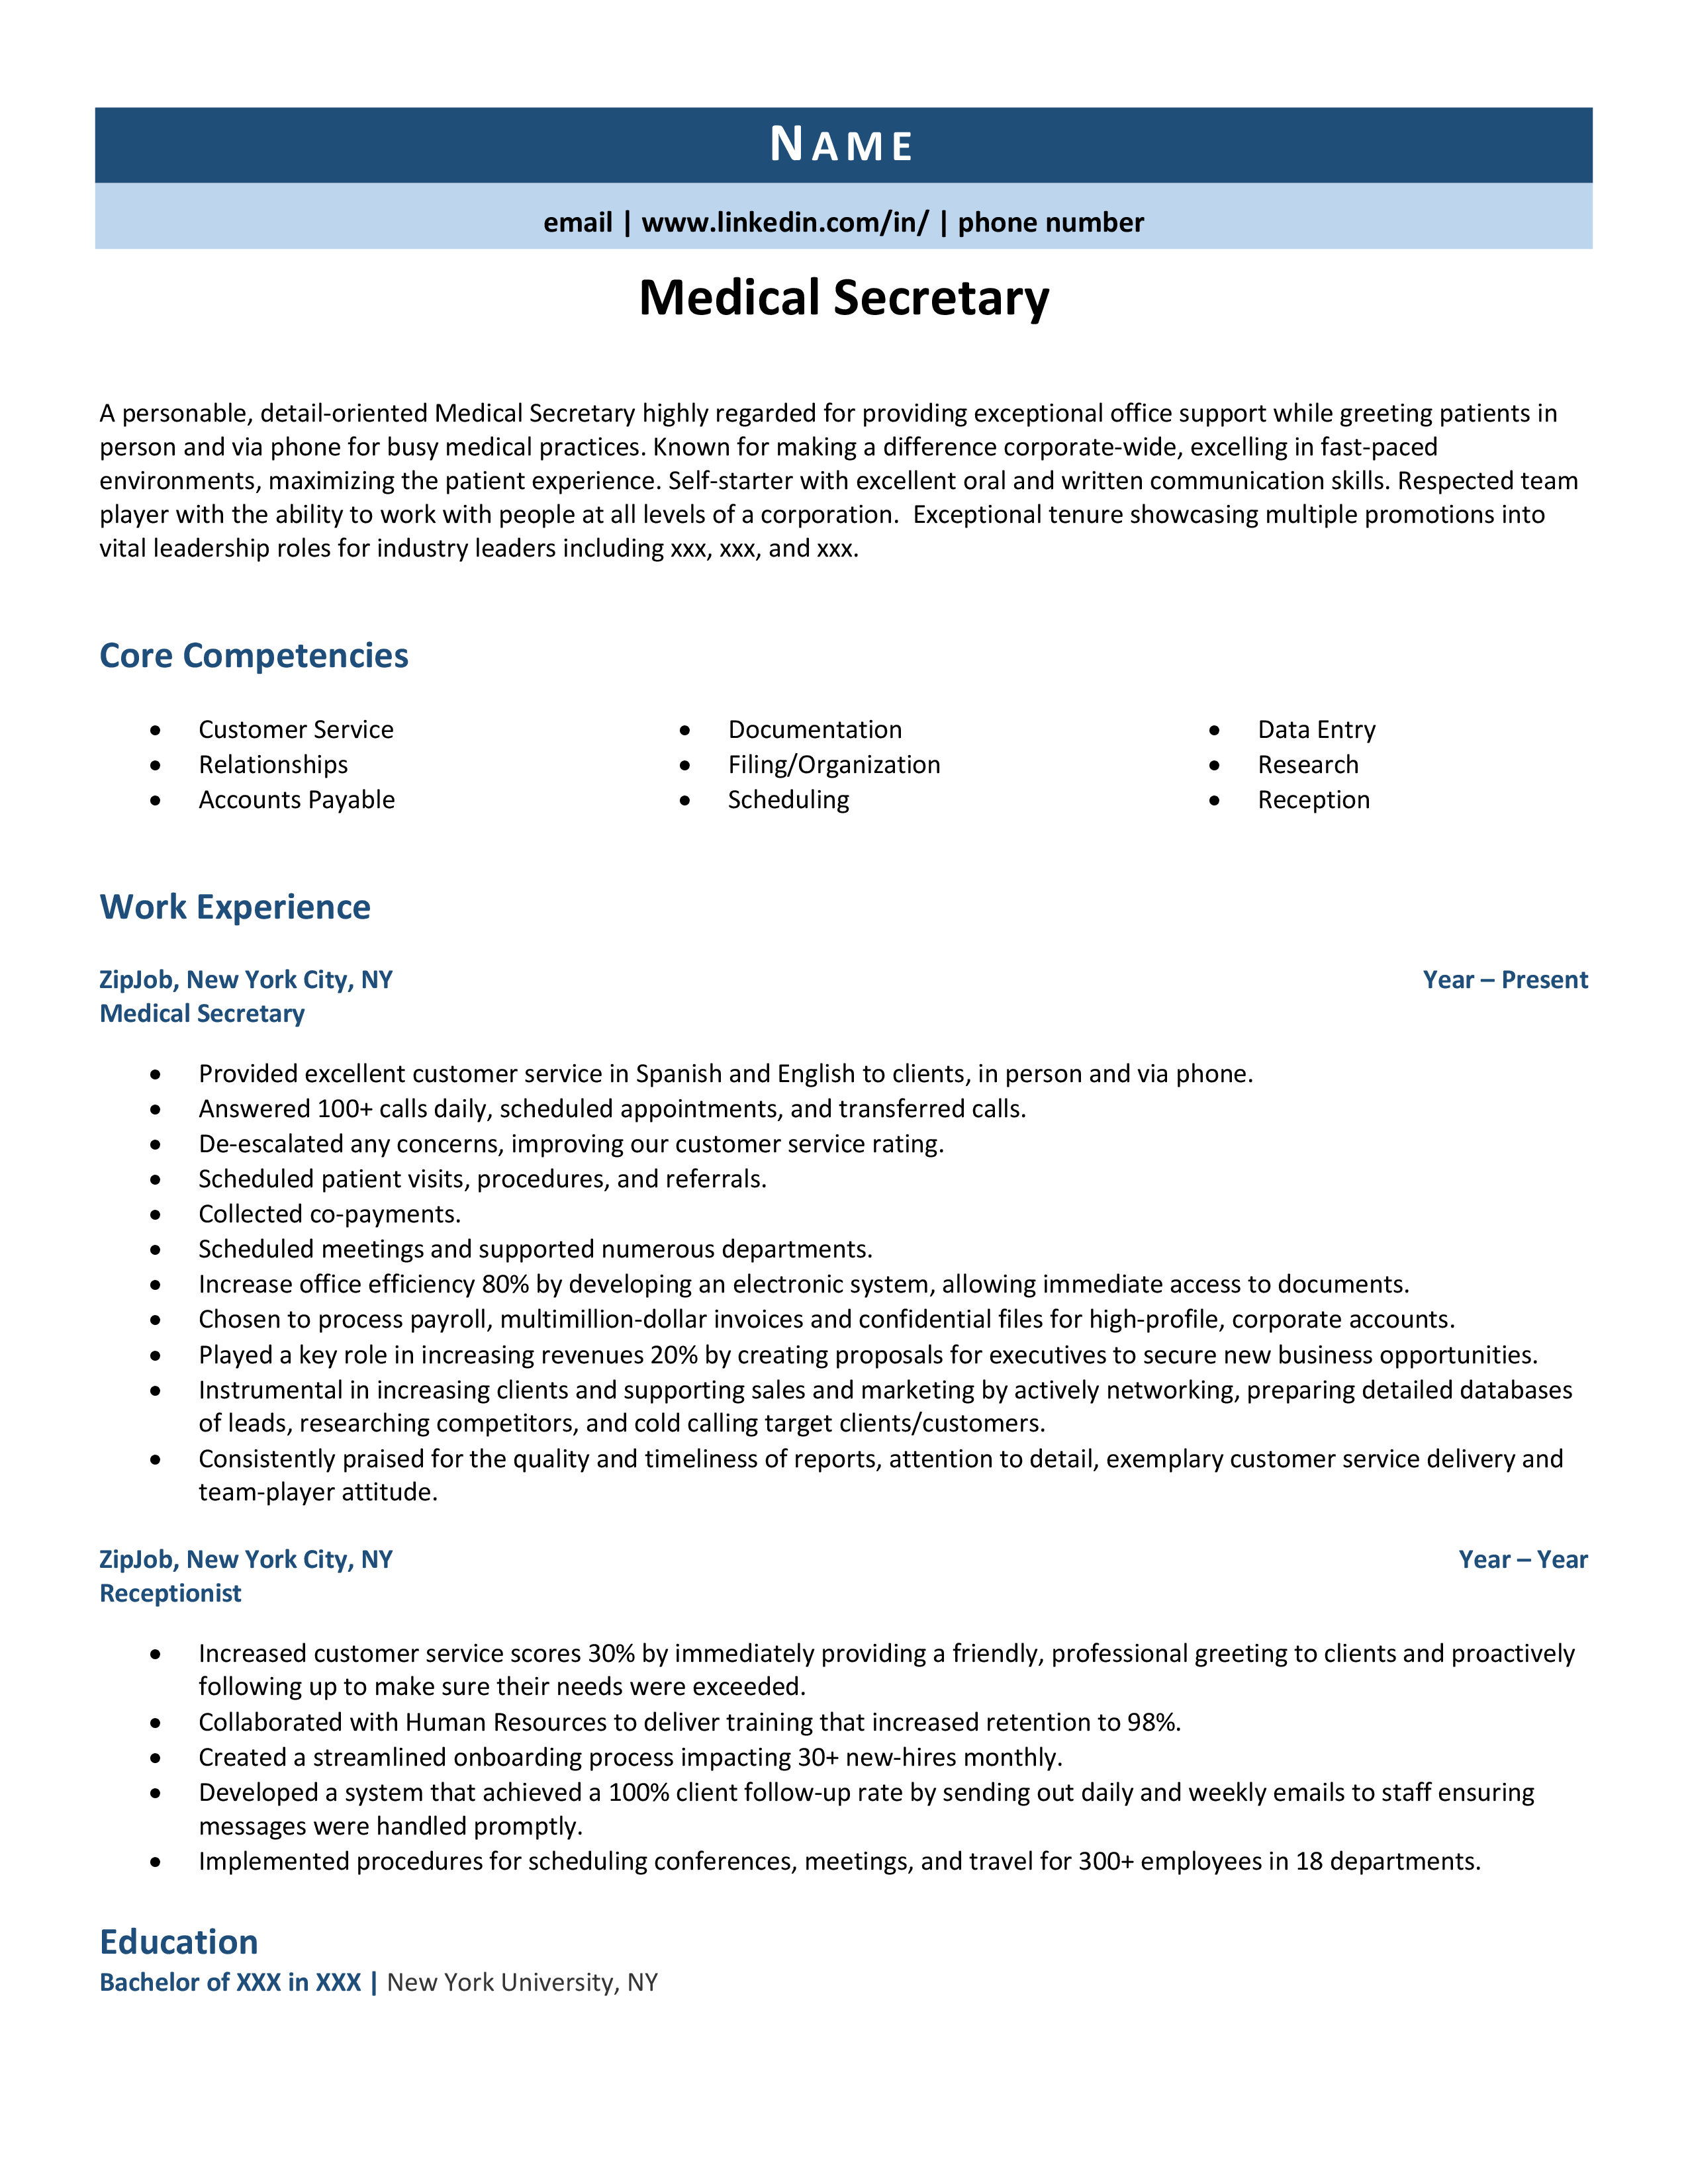 Medical Secretary Resume Example